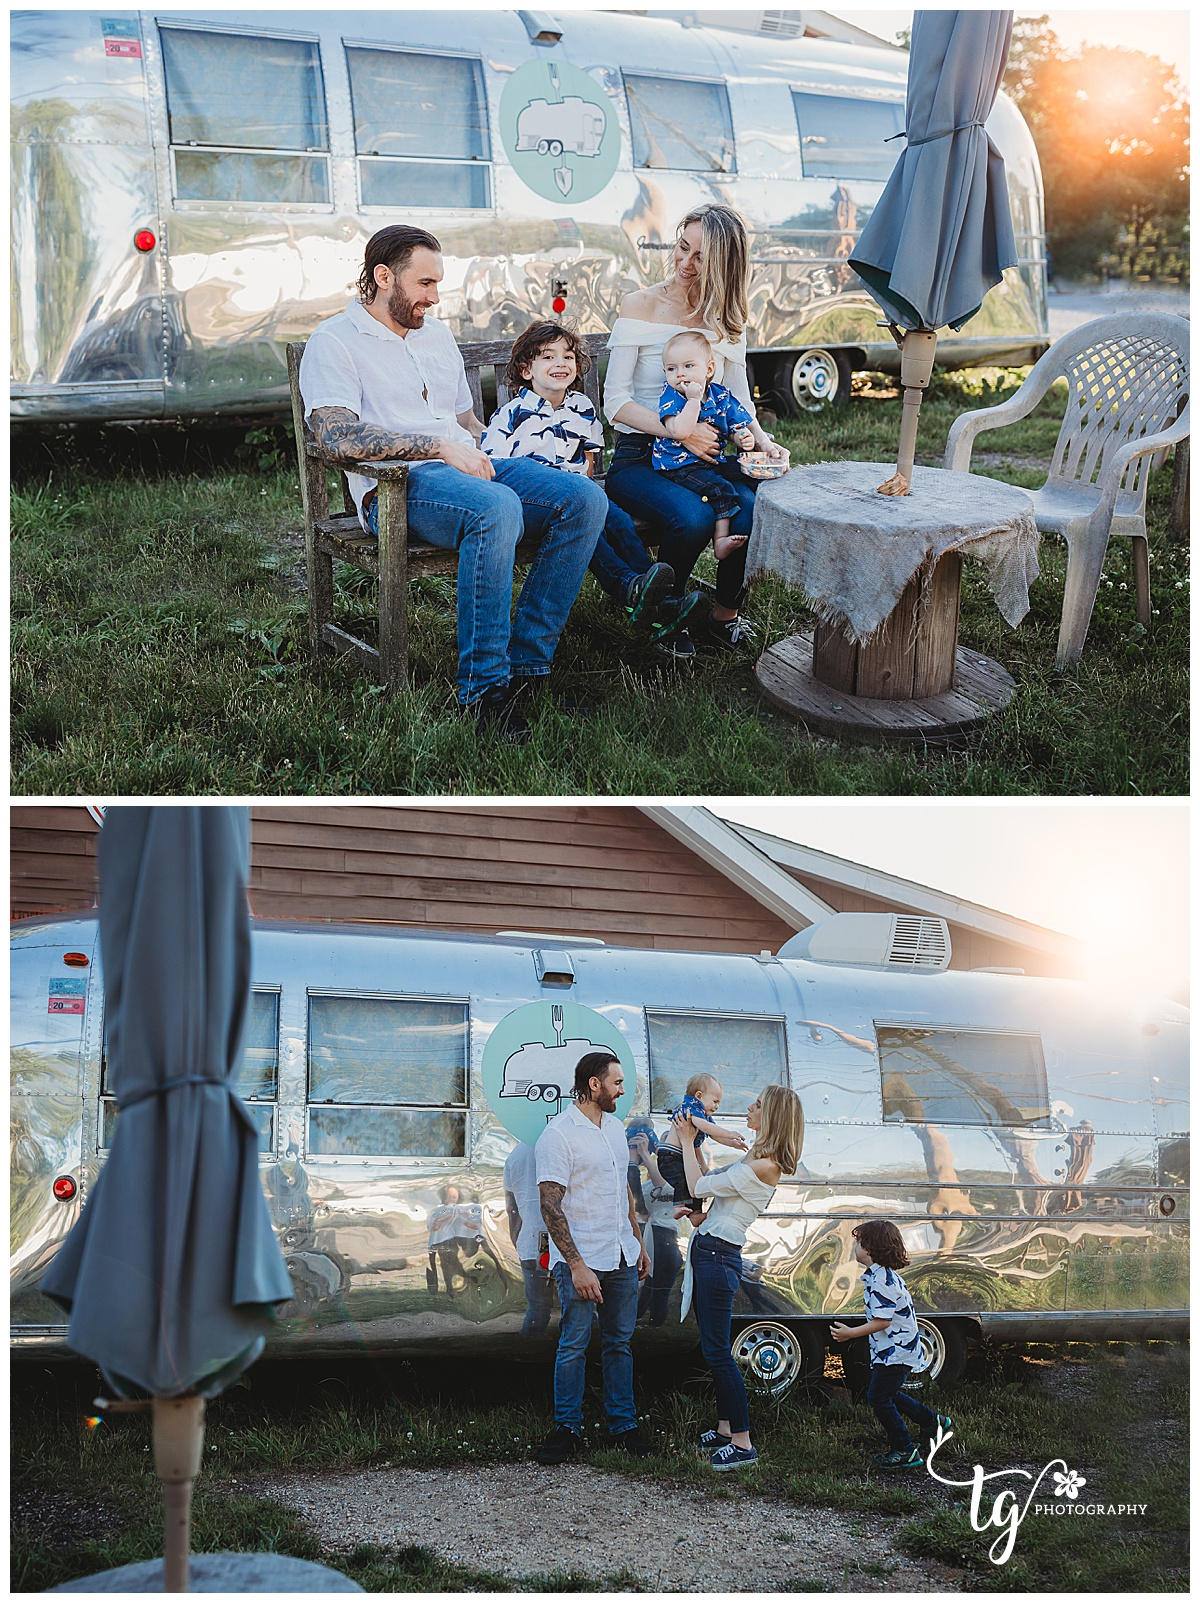 family photo session at a Farm